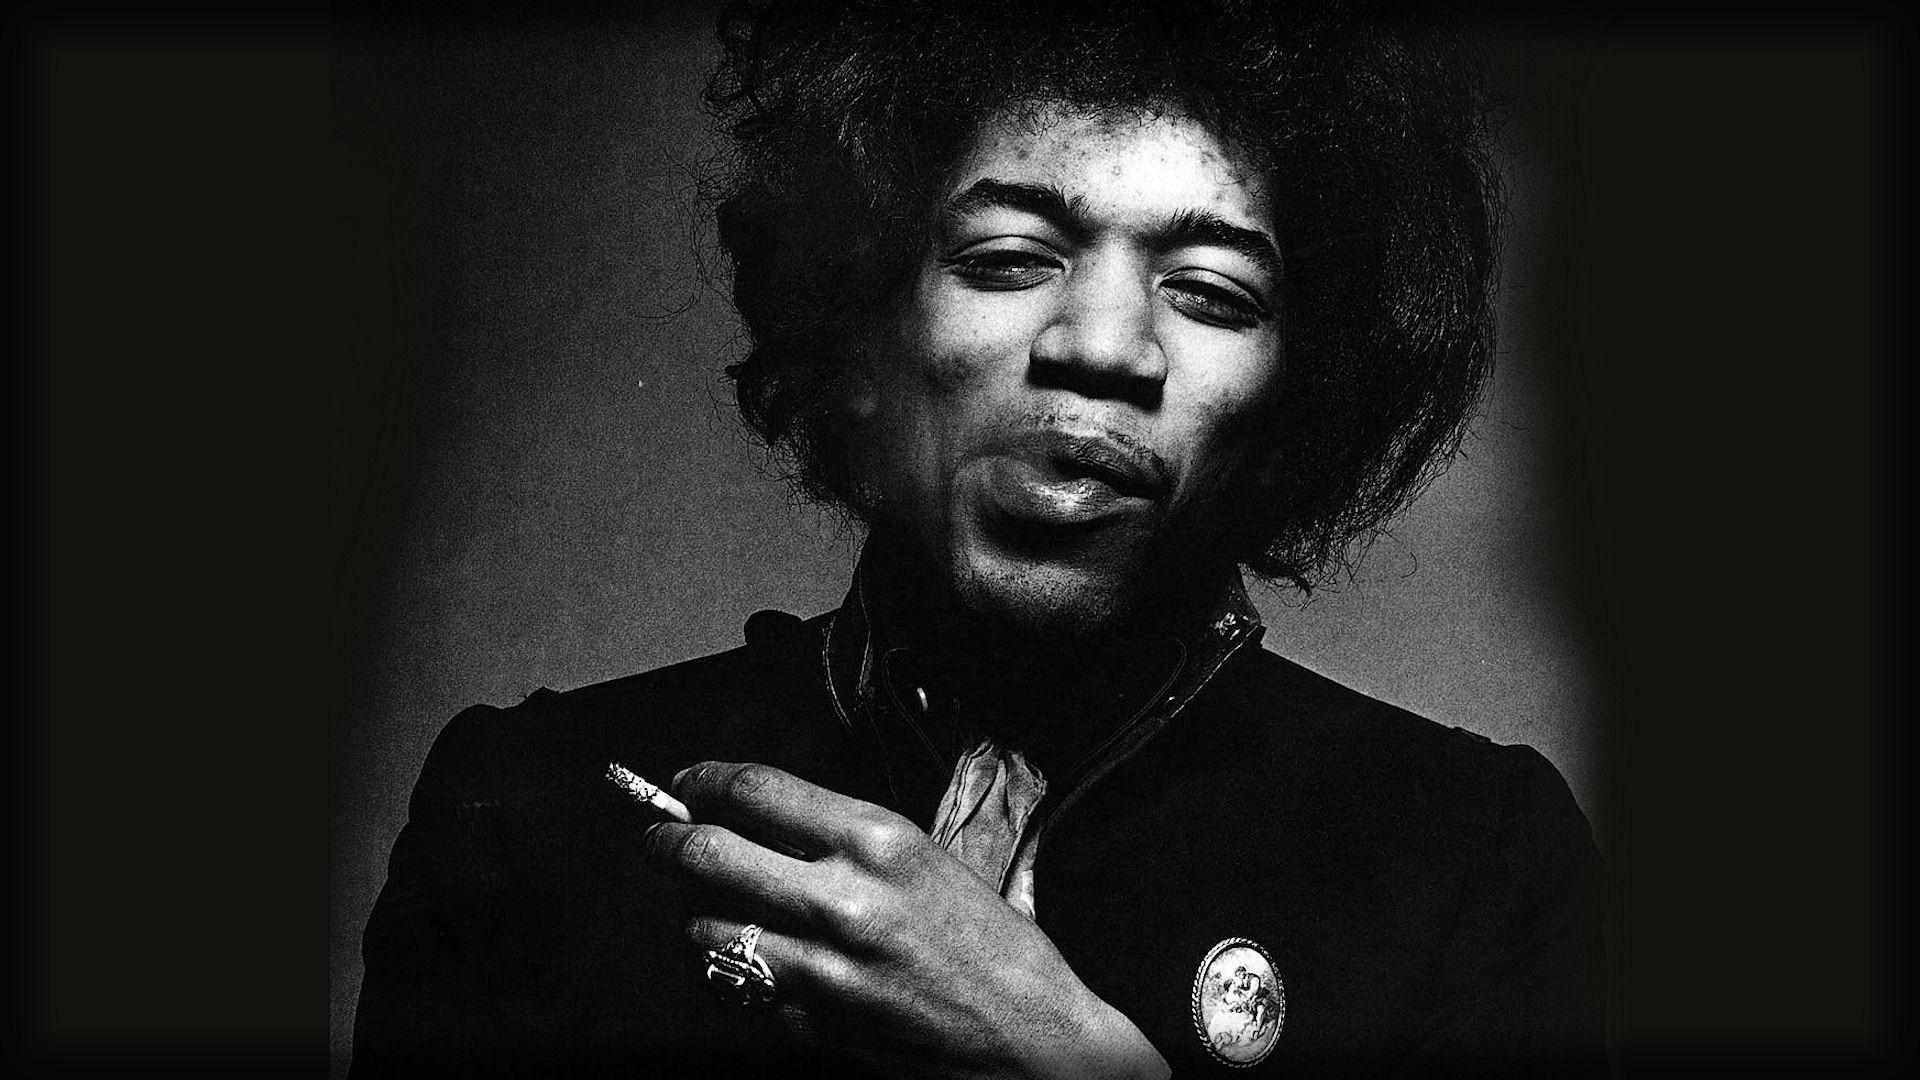 … John Lennon Wallpapers. 726 2726. Fondos De Un Nuevo Fondo HD De Jimi  Hendrix   Fondos De Pantalla De Un